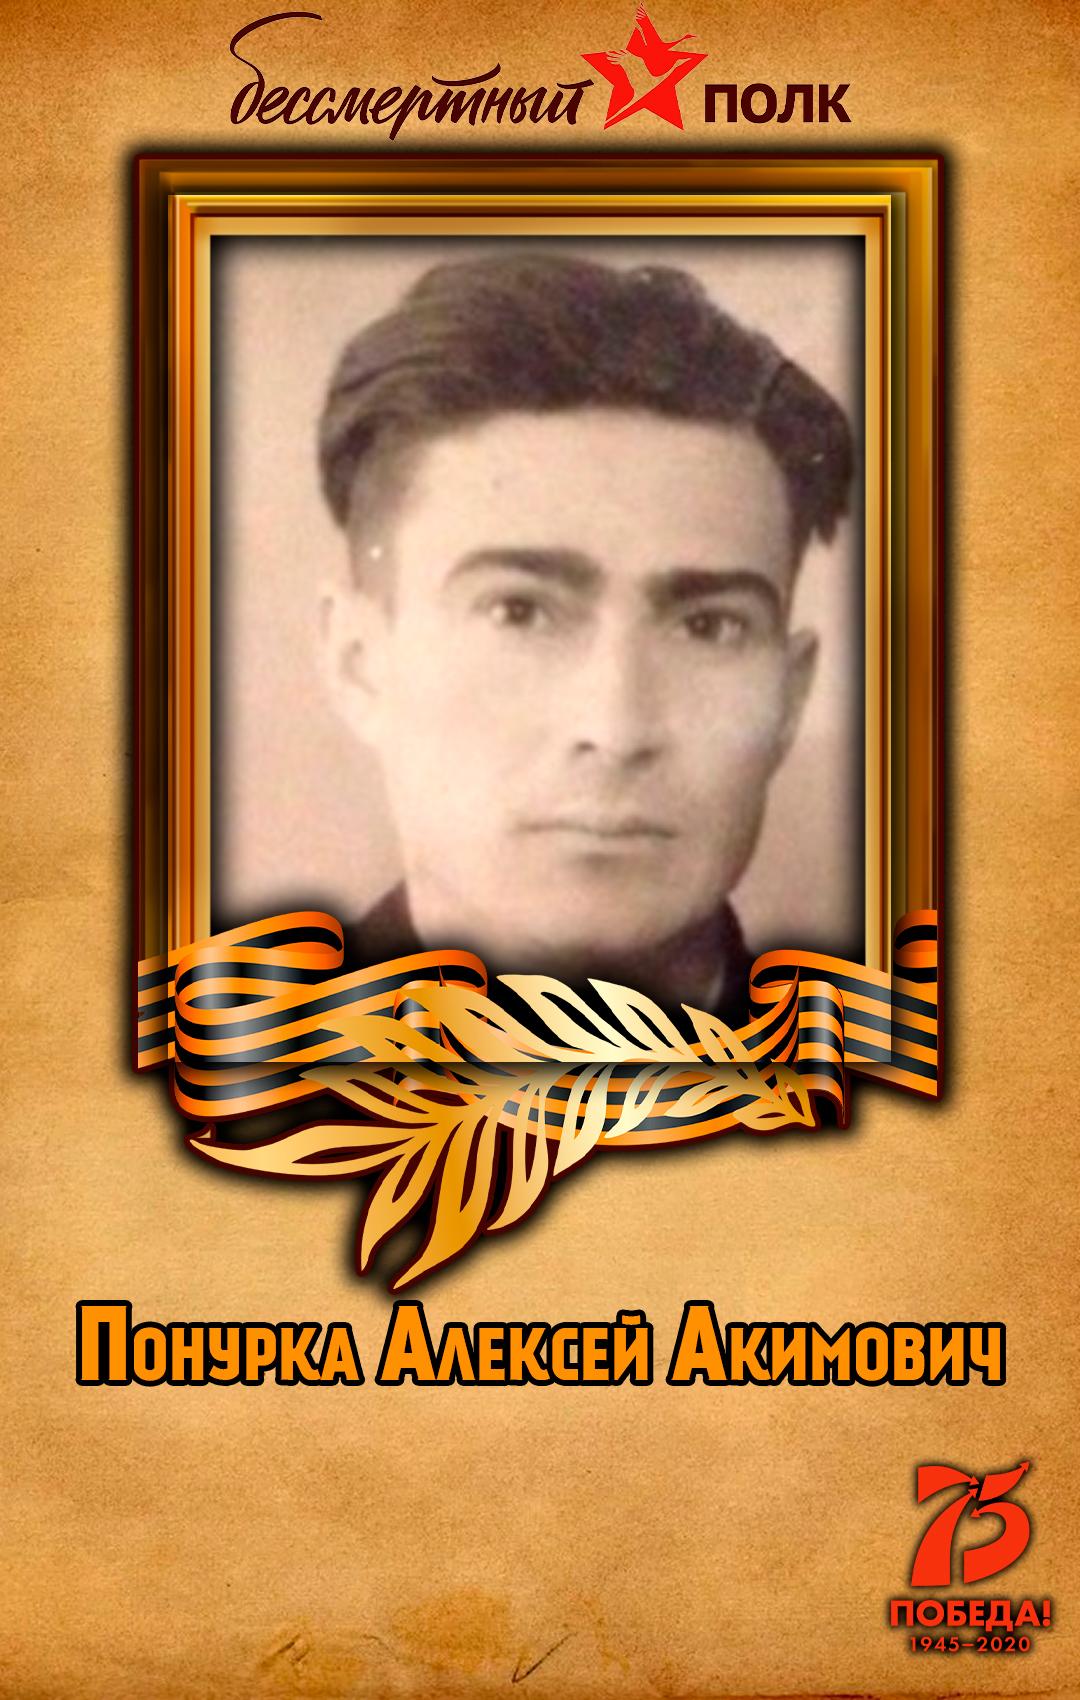 Понурка-Алексей-Акимович